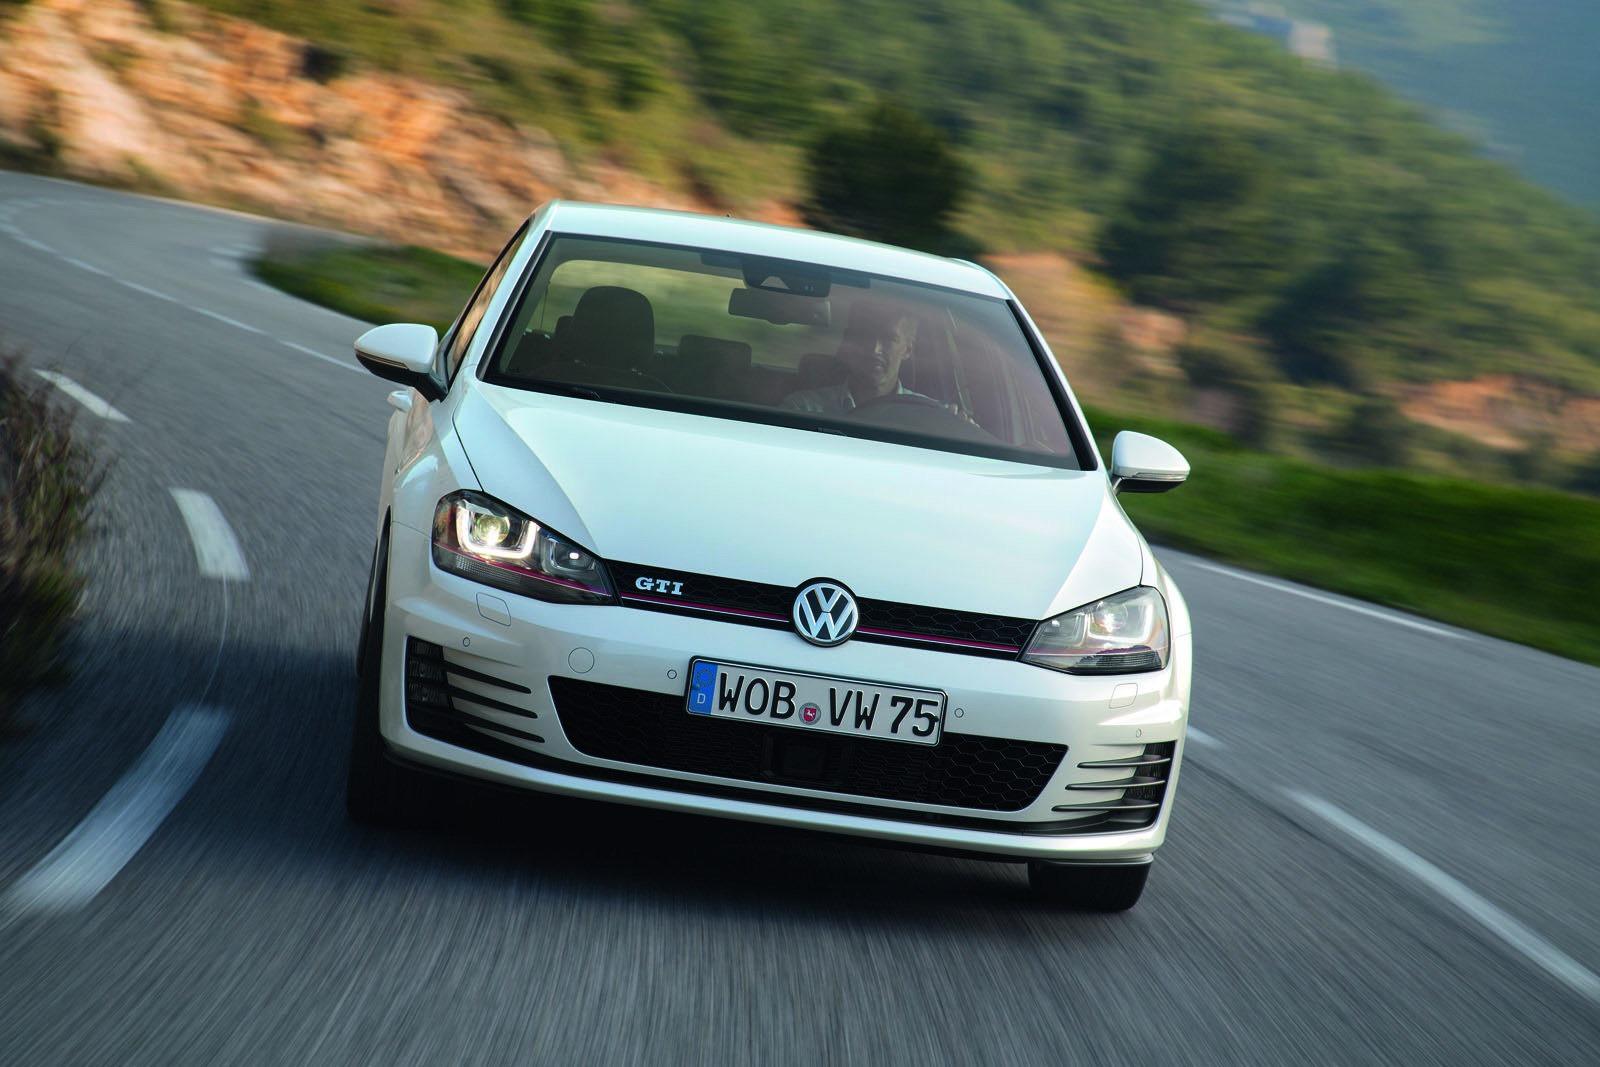 2013 Volkswagen Golf GTI New Photos Released - autoevolution